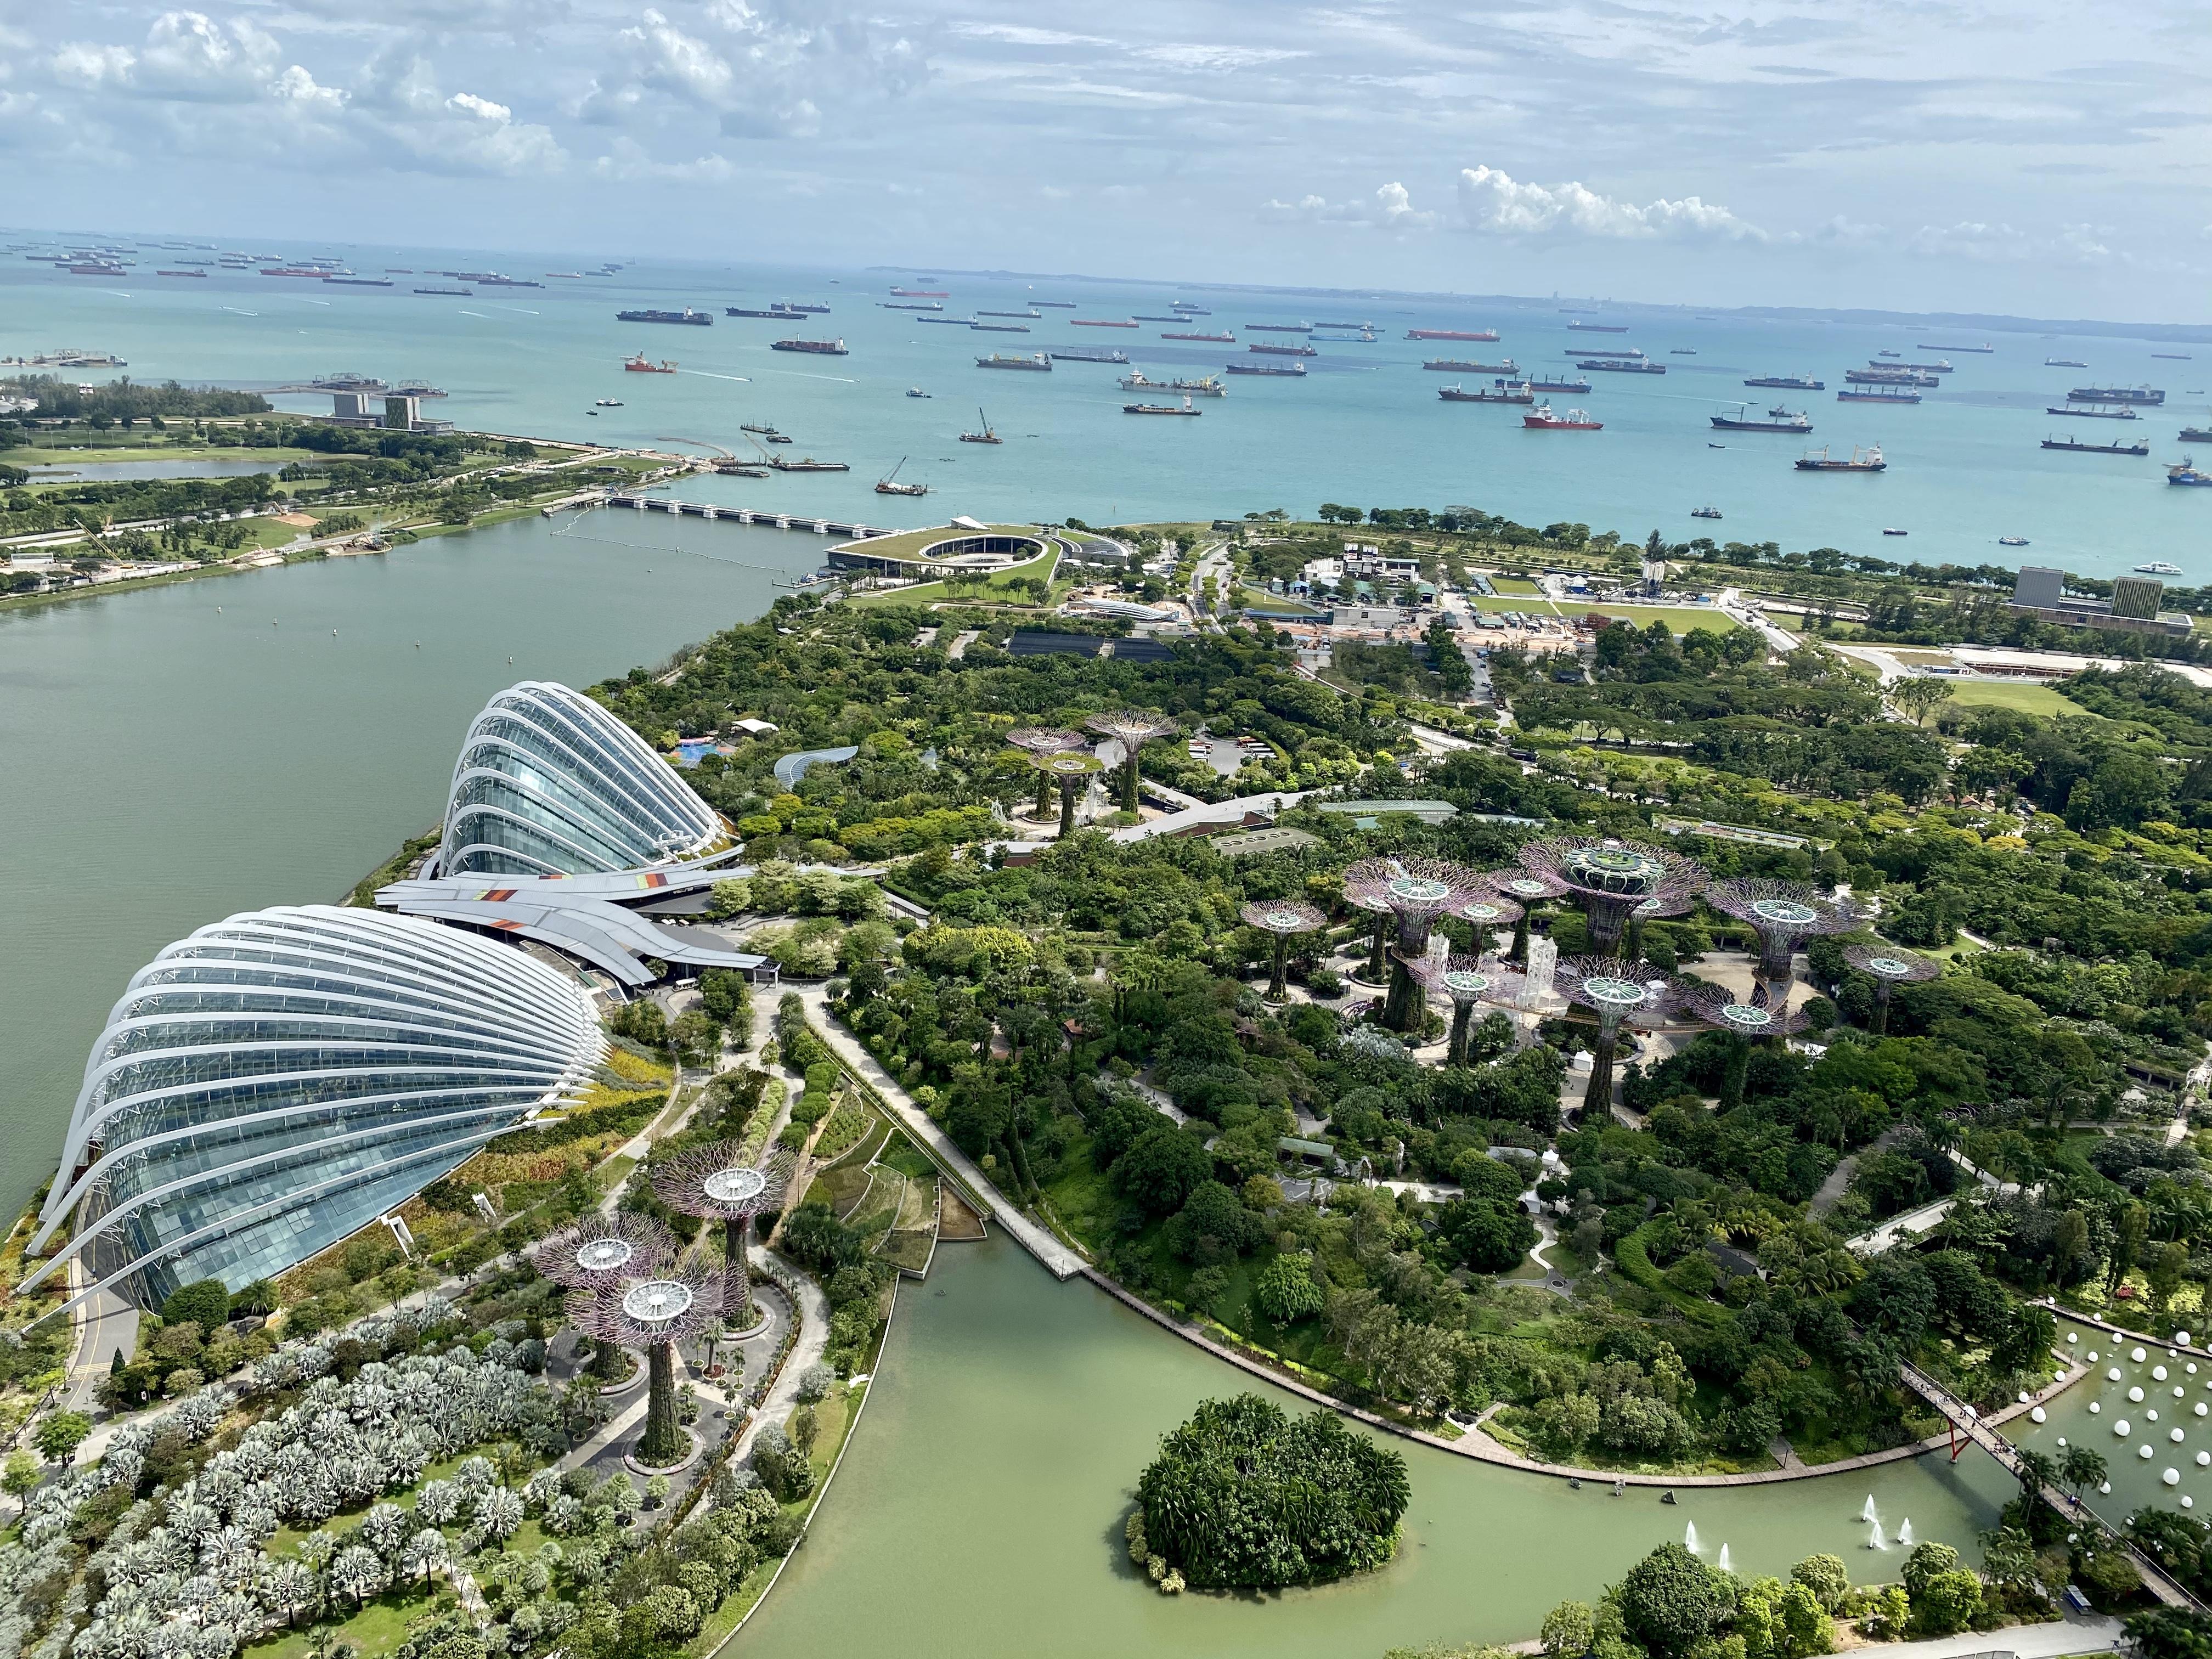 Aussichtsplattform Marina Bay Sands